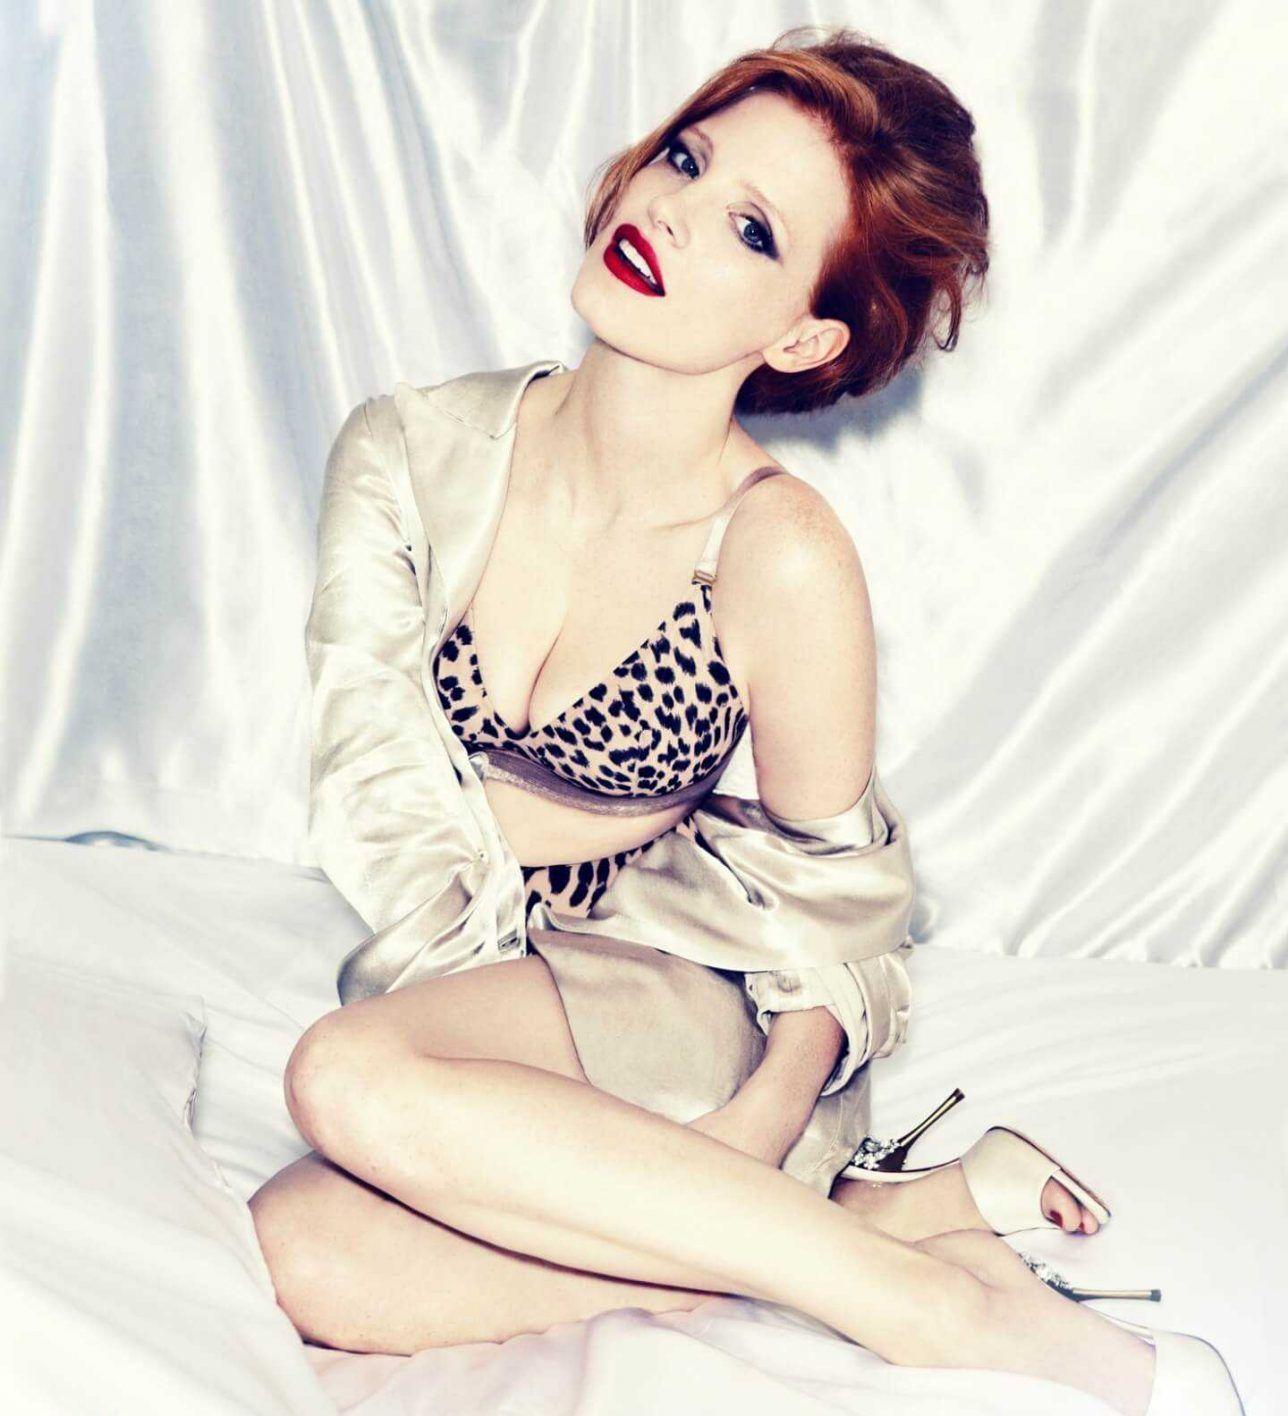 Jessica Chastain sexy boobs pics